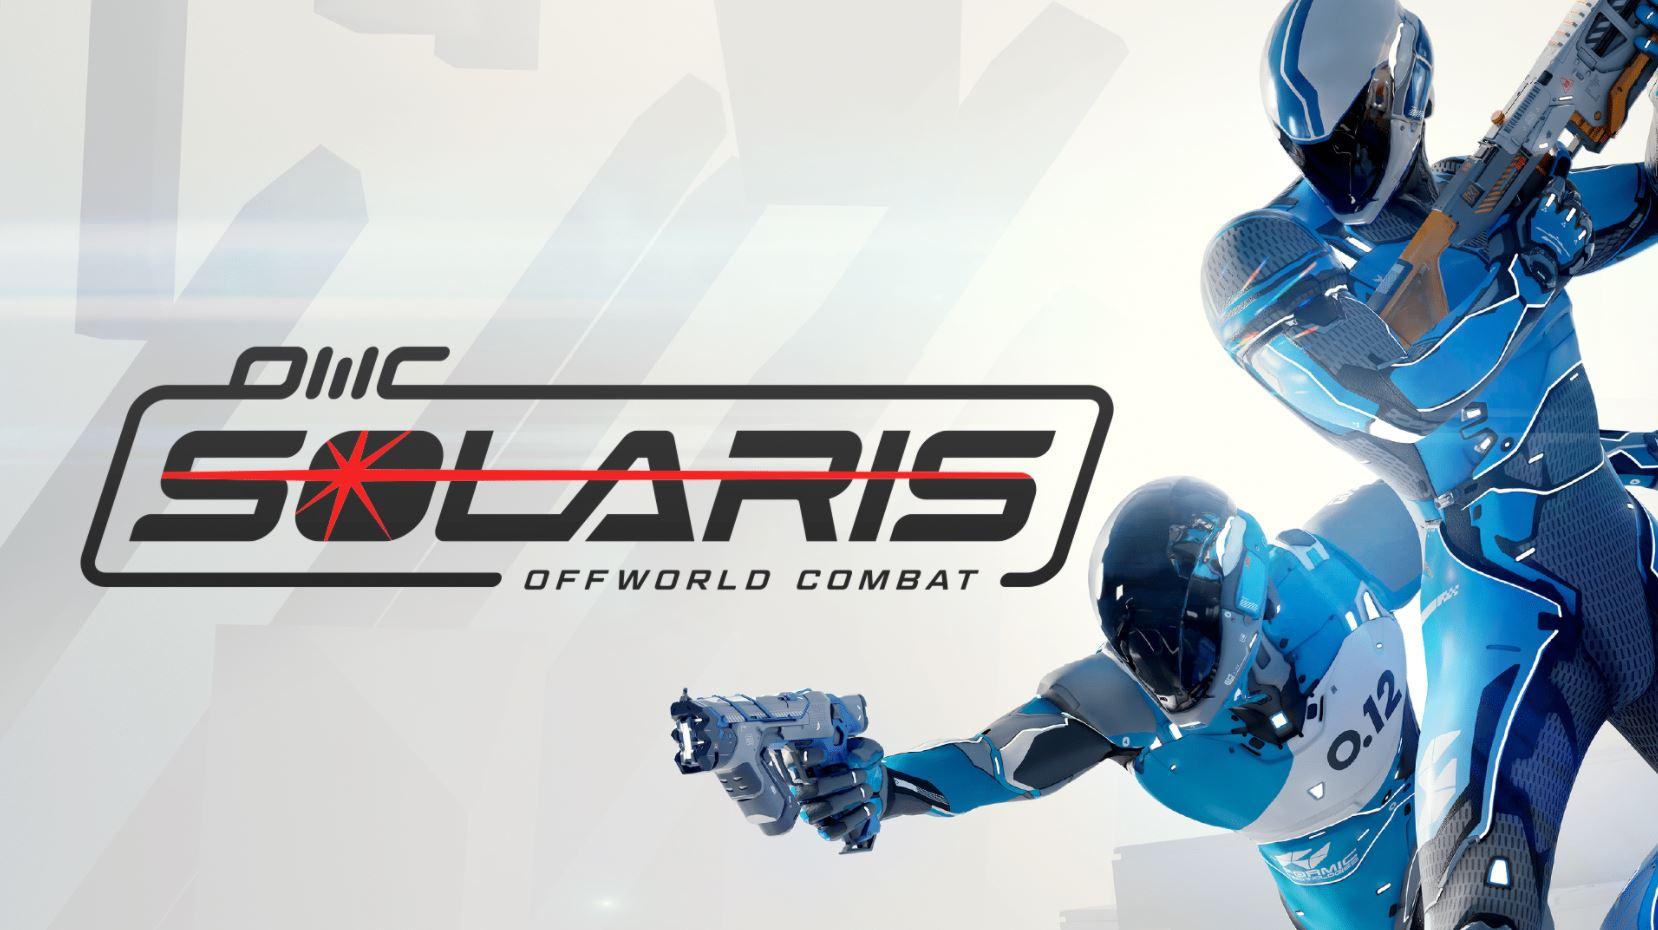 solaris-offworld-combat-news-reviews-videos